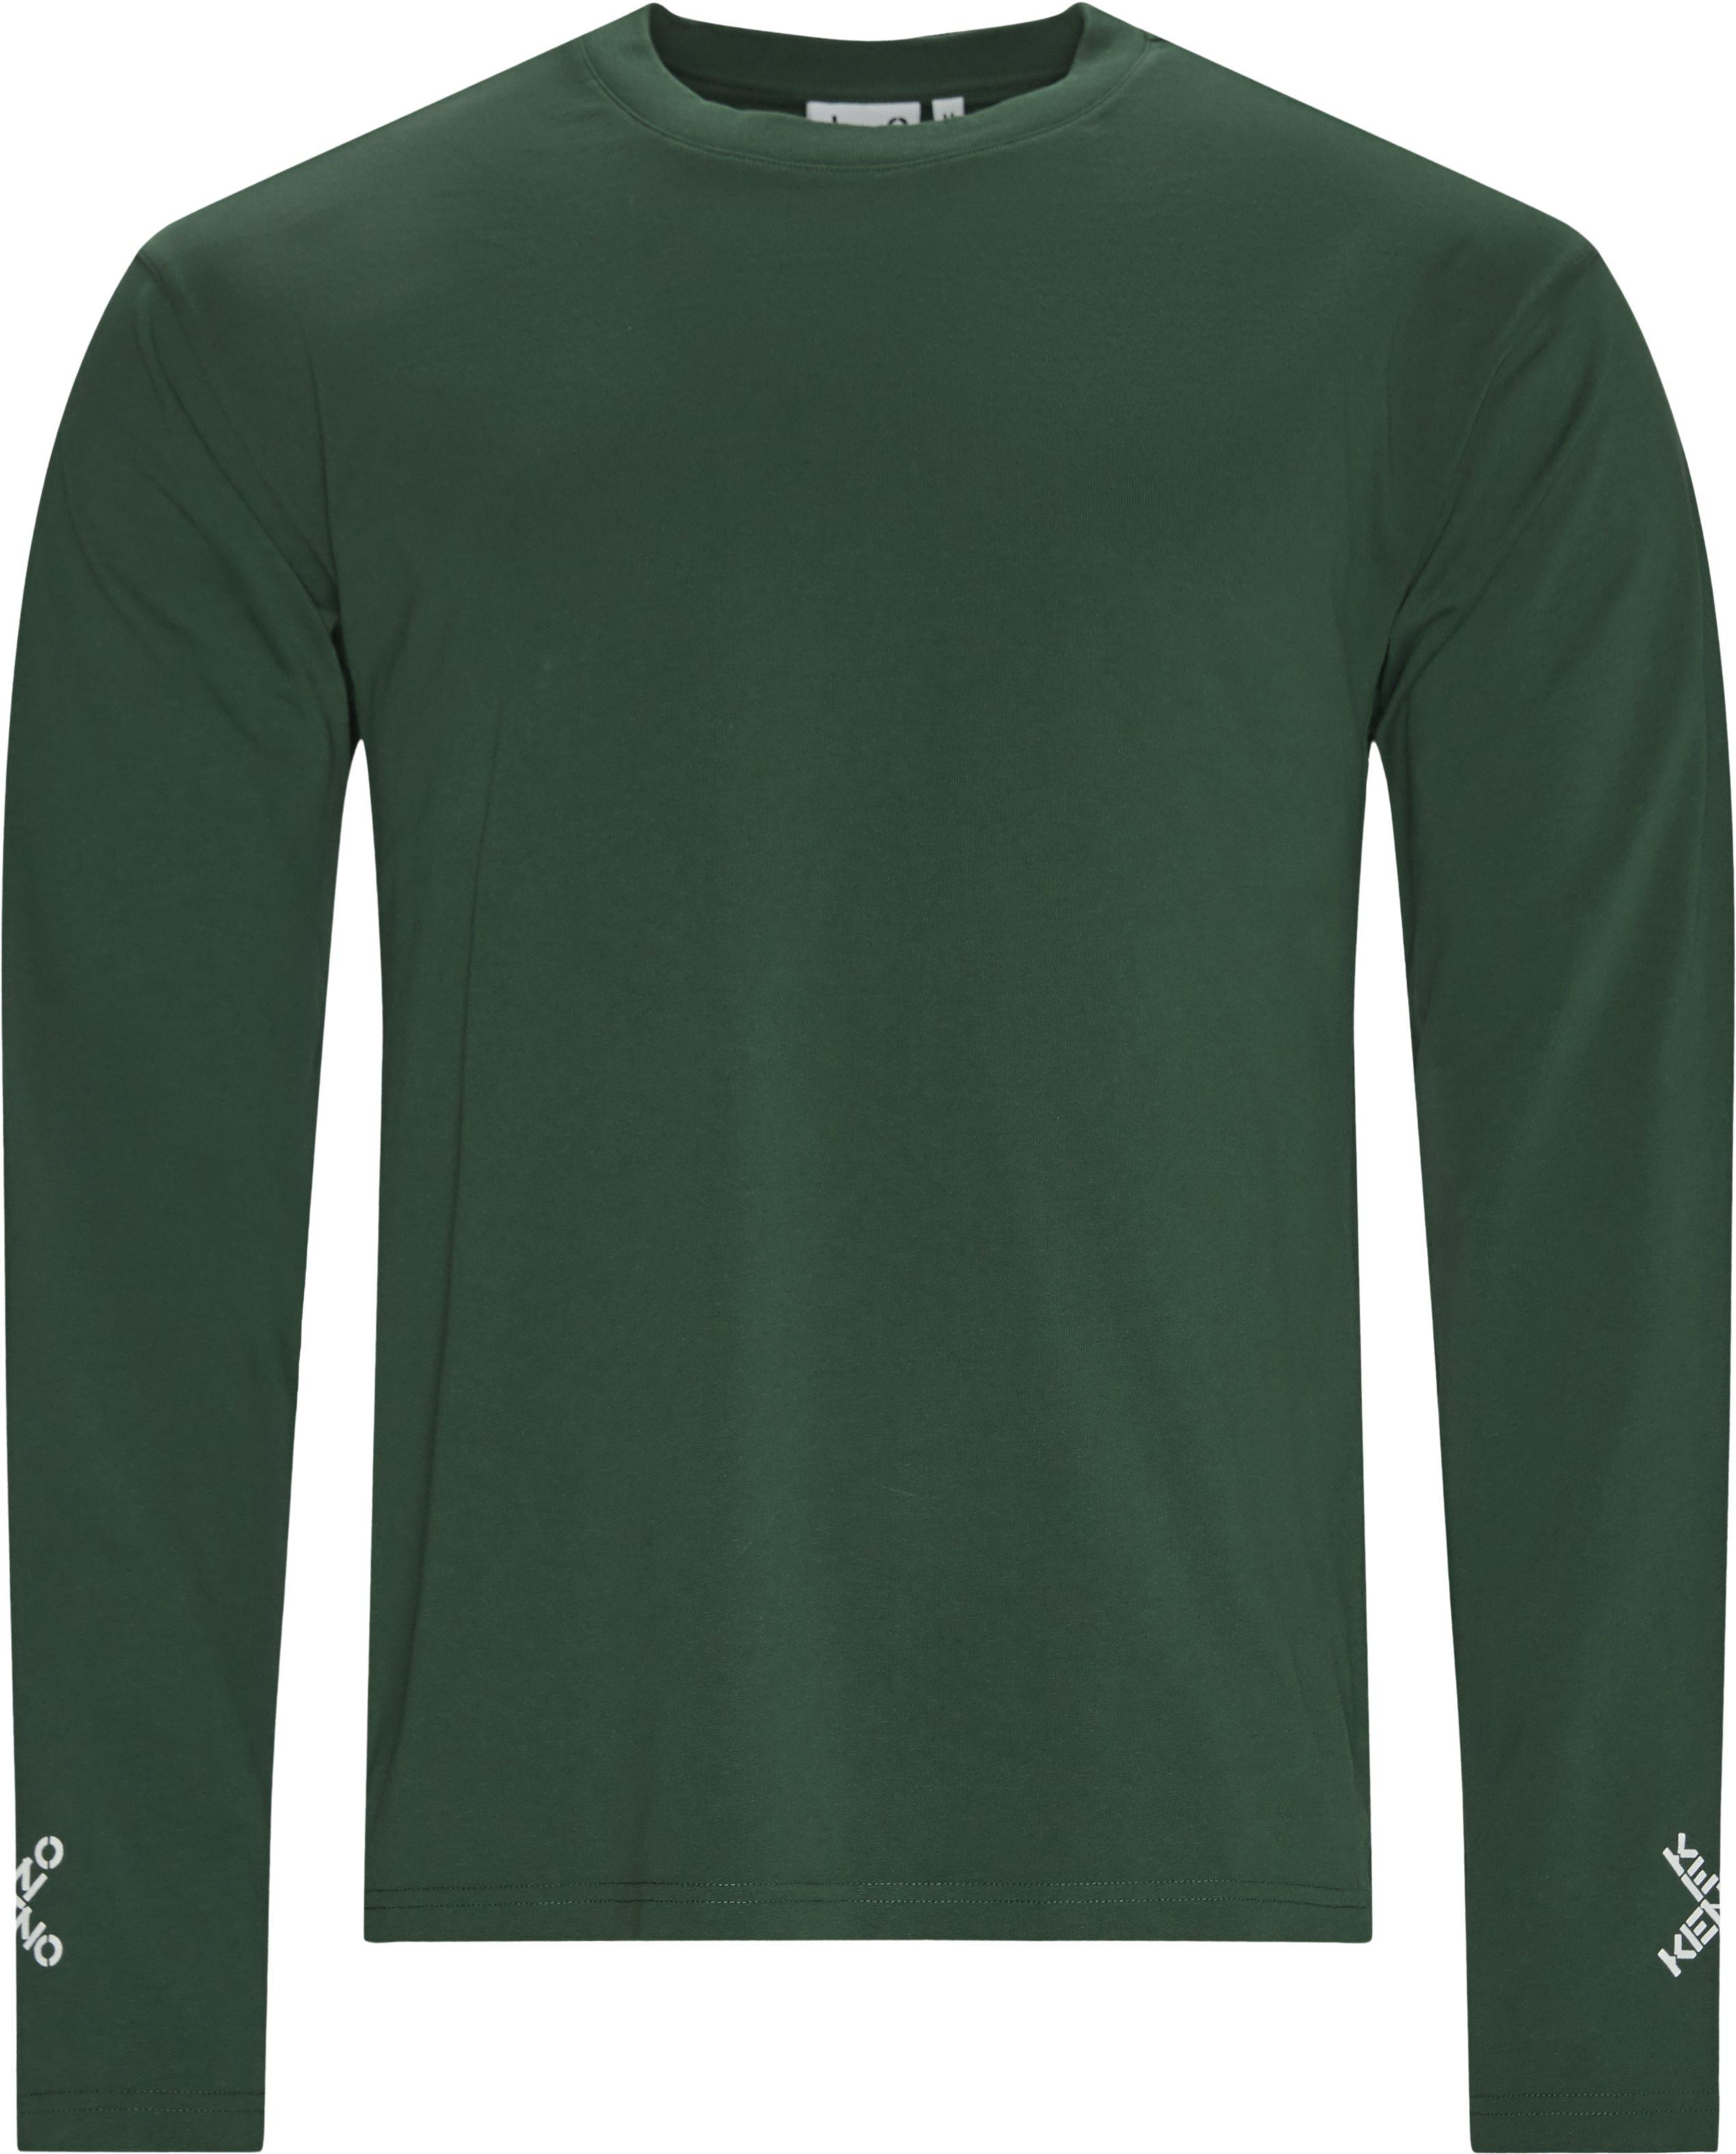 Long-sleeved t-shirts - Regular fit - Green